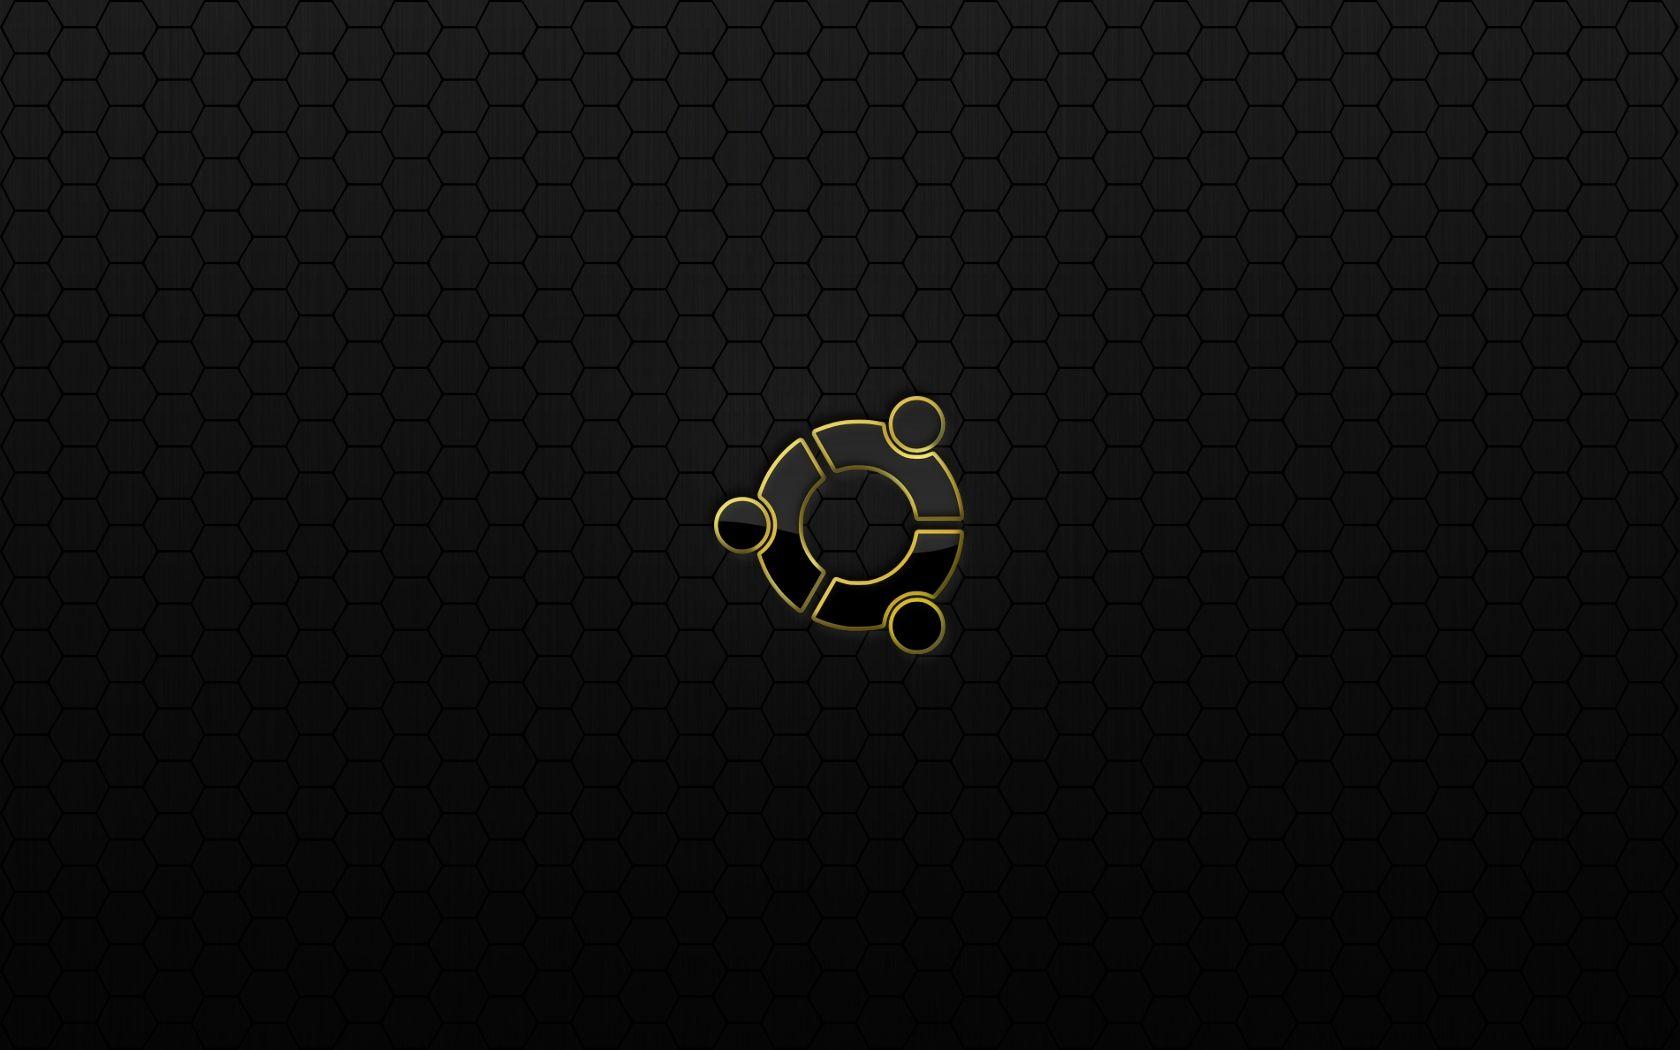 Linux Ubuntu Hive Hd Wallpaper Wallpaper Sacred Geometric Symbols Linux ubuntu 3d logo hd wallpaper free